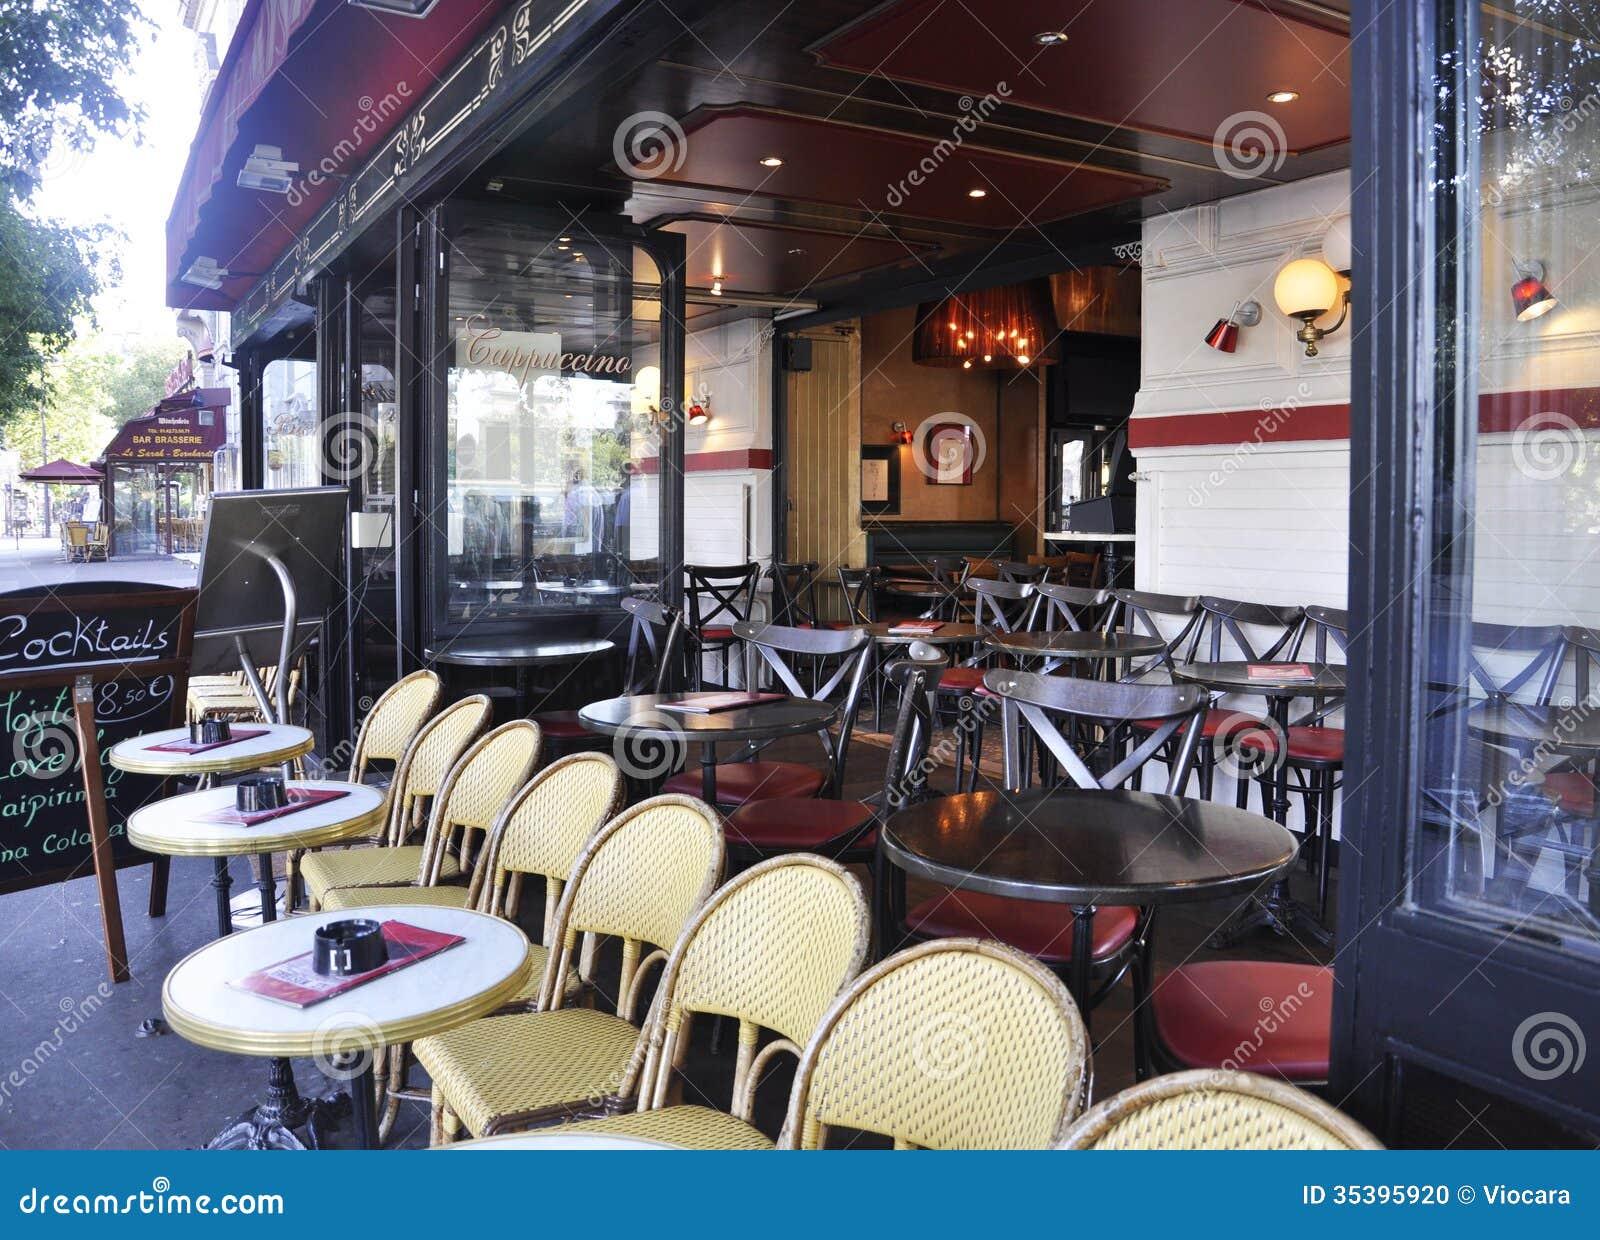 paris august 15 2013 terrace in paris editorial image image 35395920. Black Bedroom Furniture Sets. Home Design Ideas